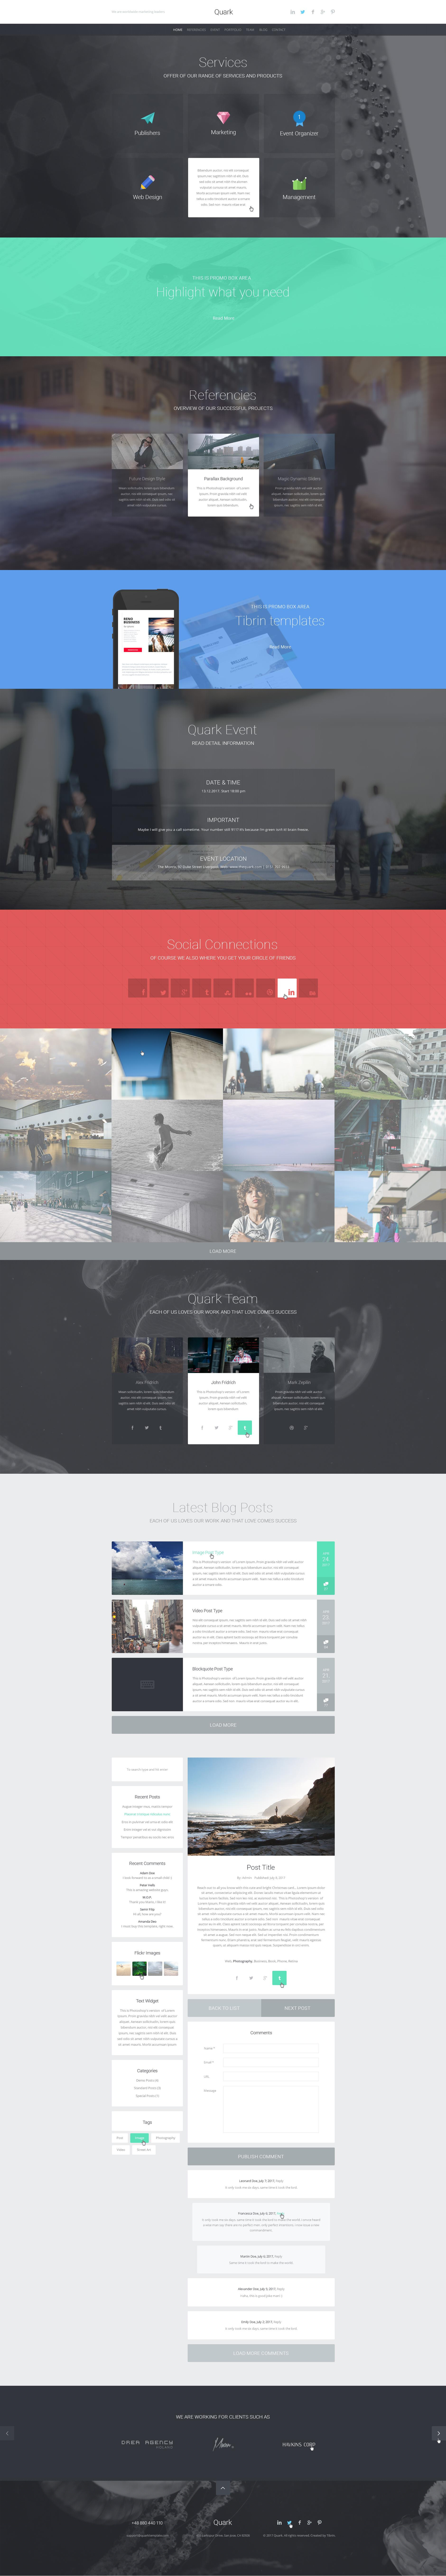 Quark - Creative Marketing PSD Template by tibrin | ThemeForest